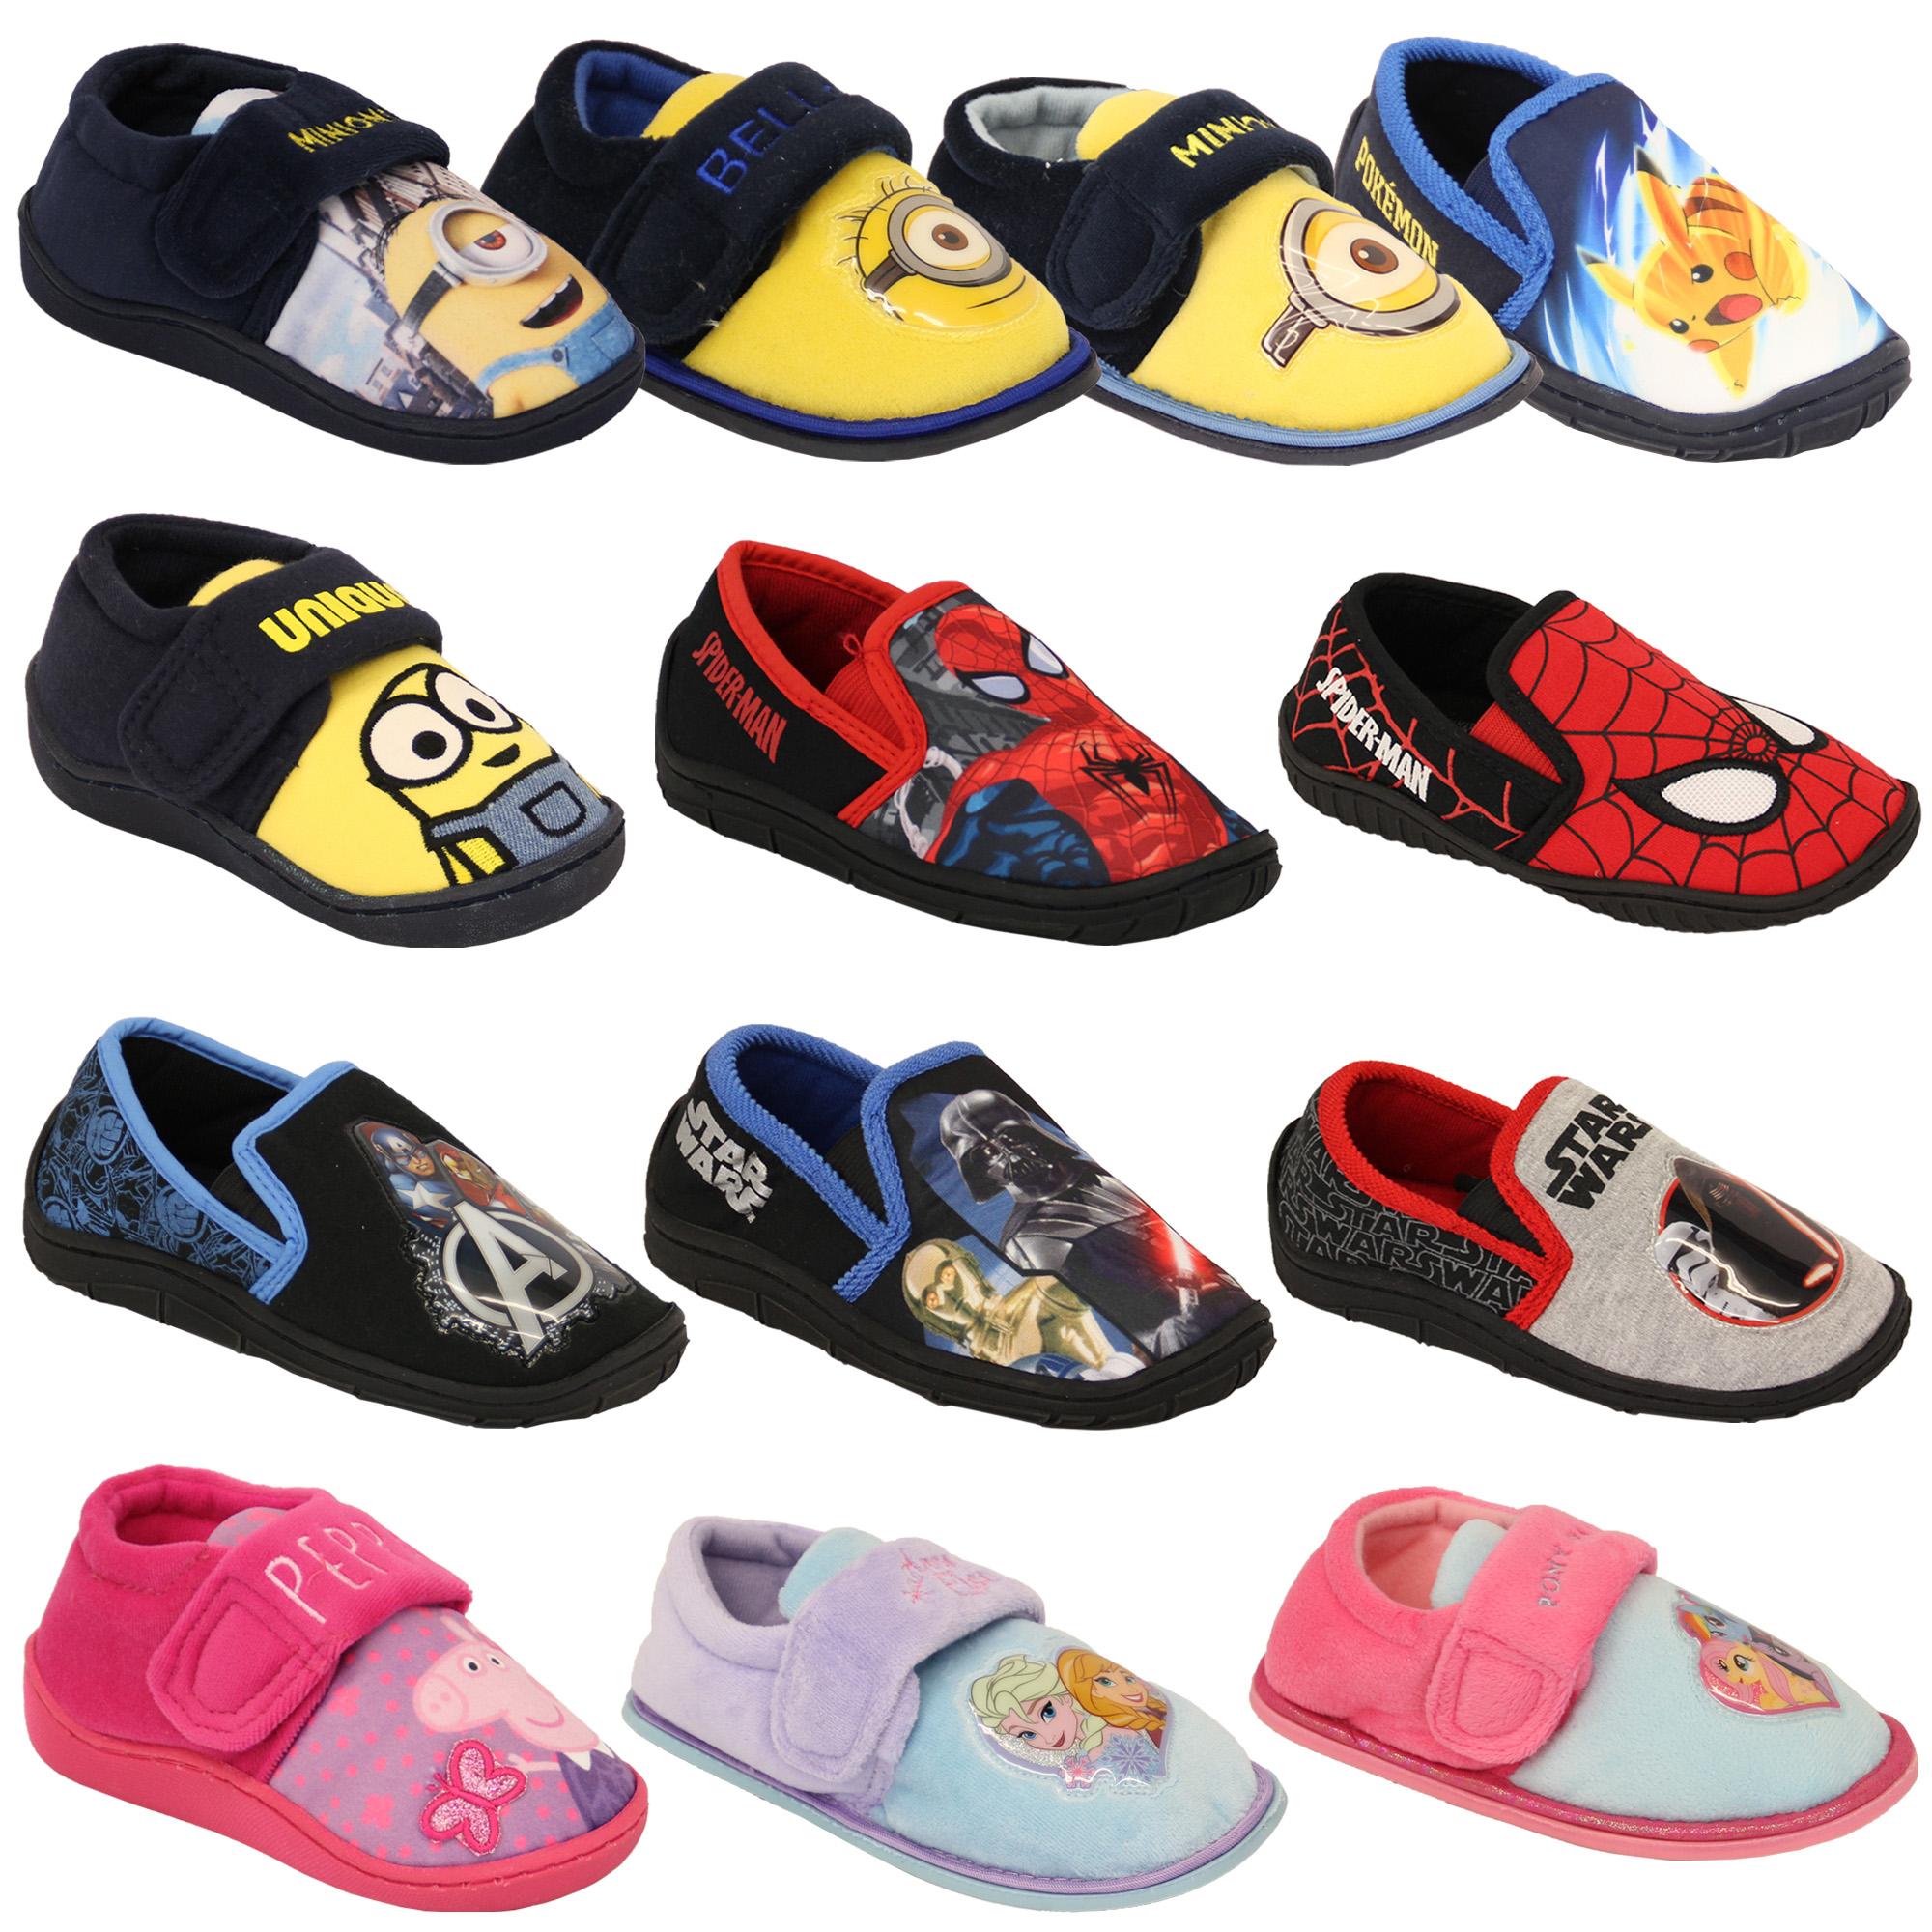 Boys-Girls-Shoes-Minion-Kids-Trainers-Star-Wars-Disney-Spiderman-Slipper thumbnail 5